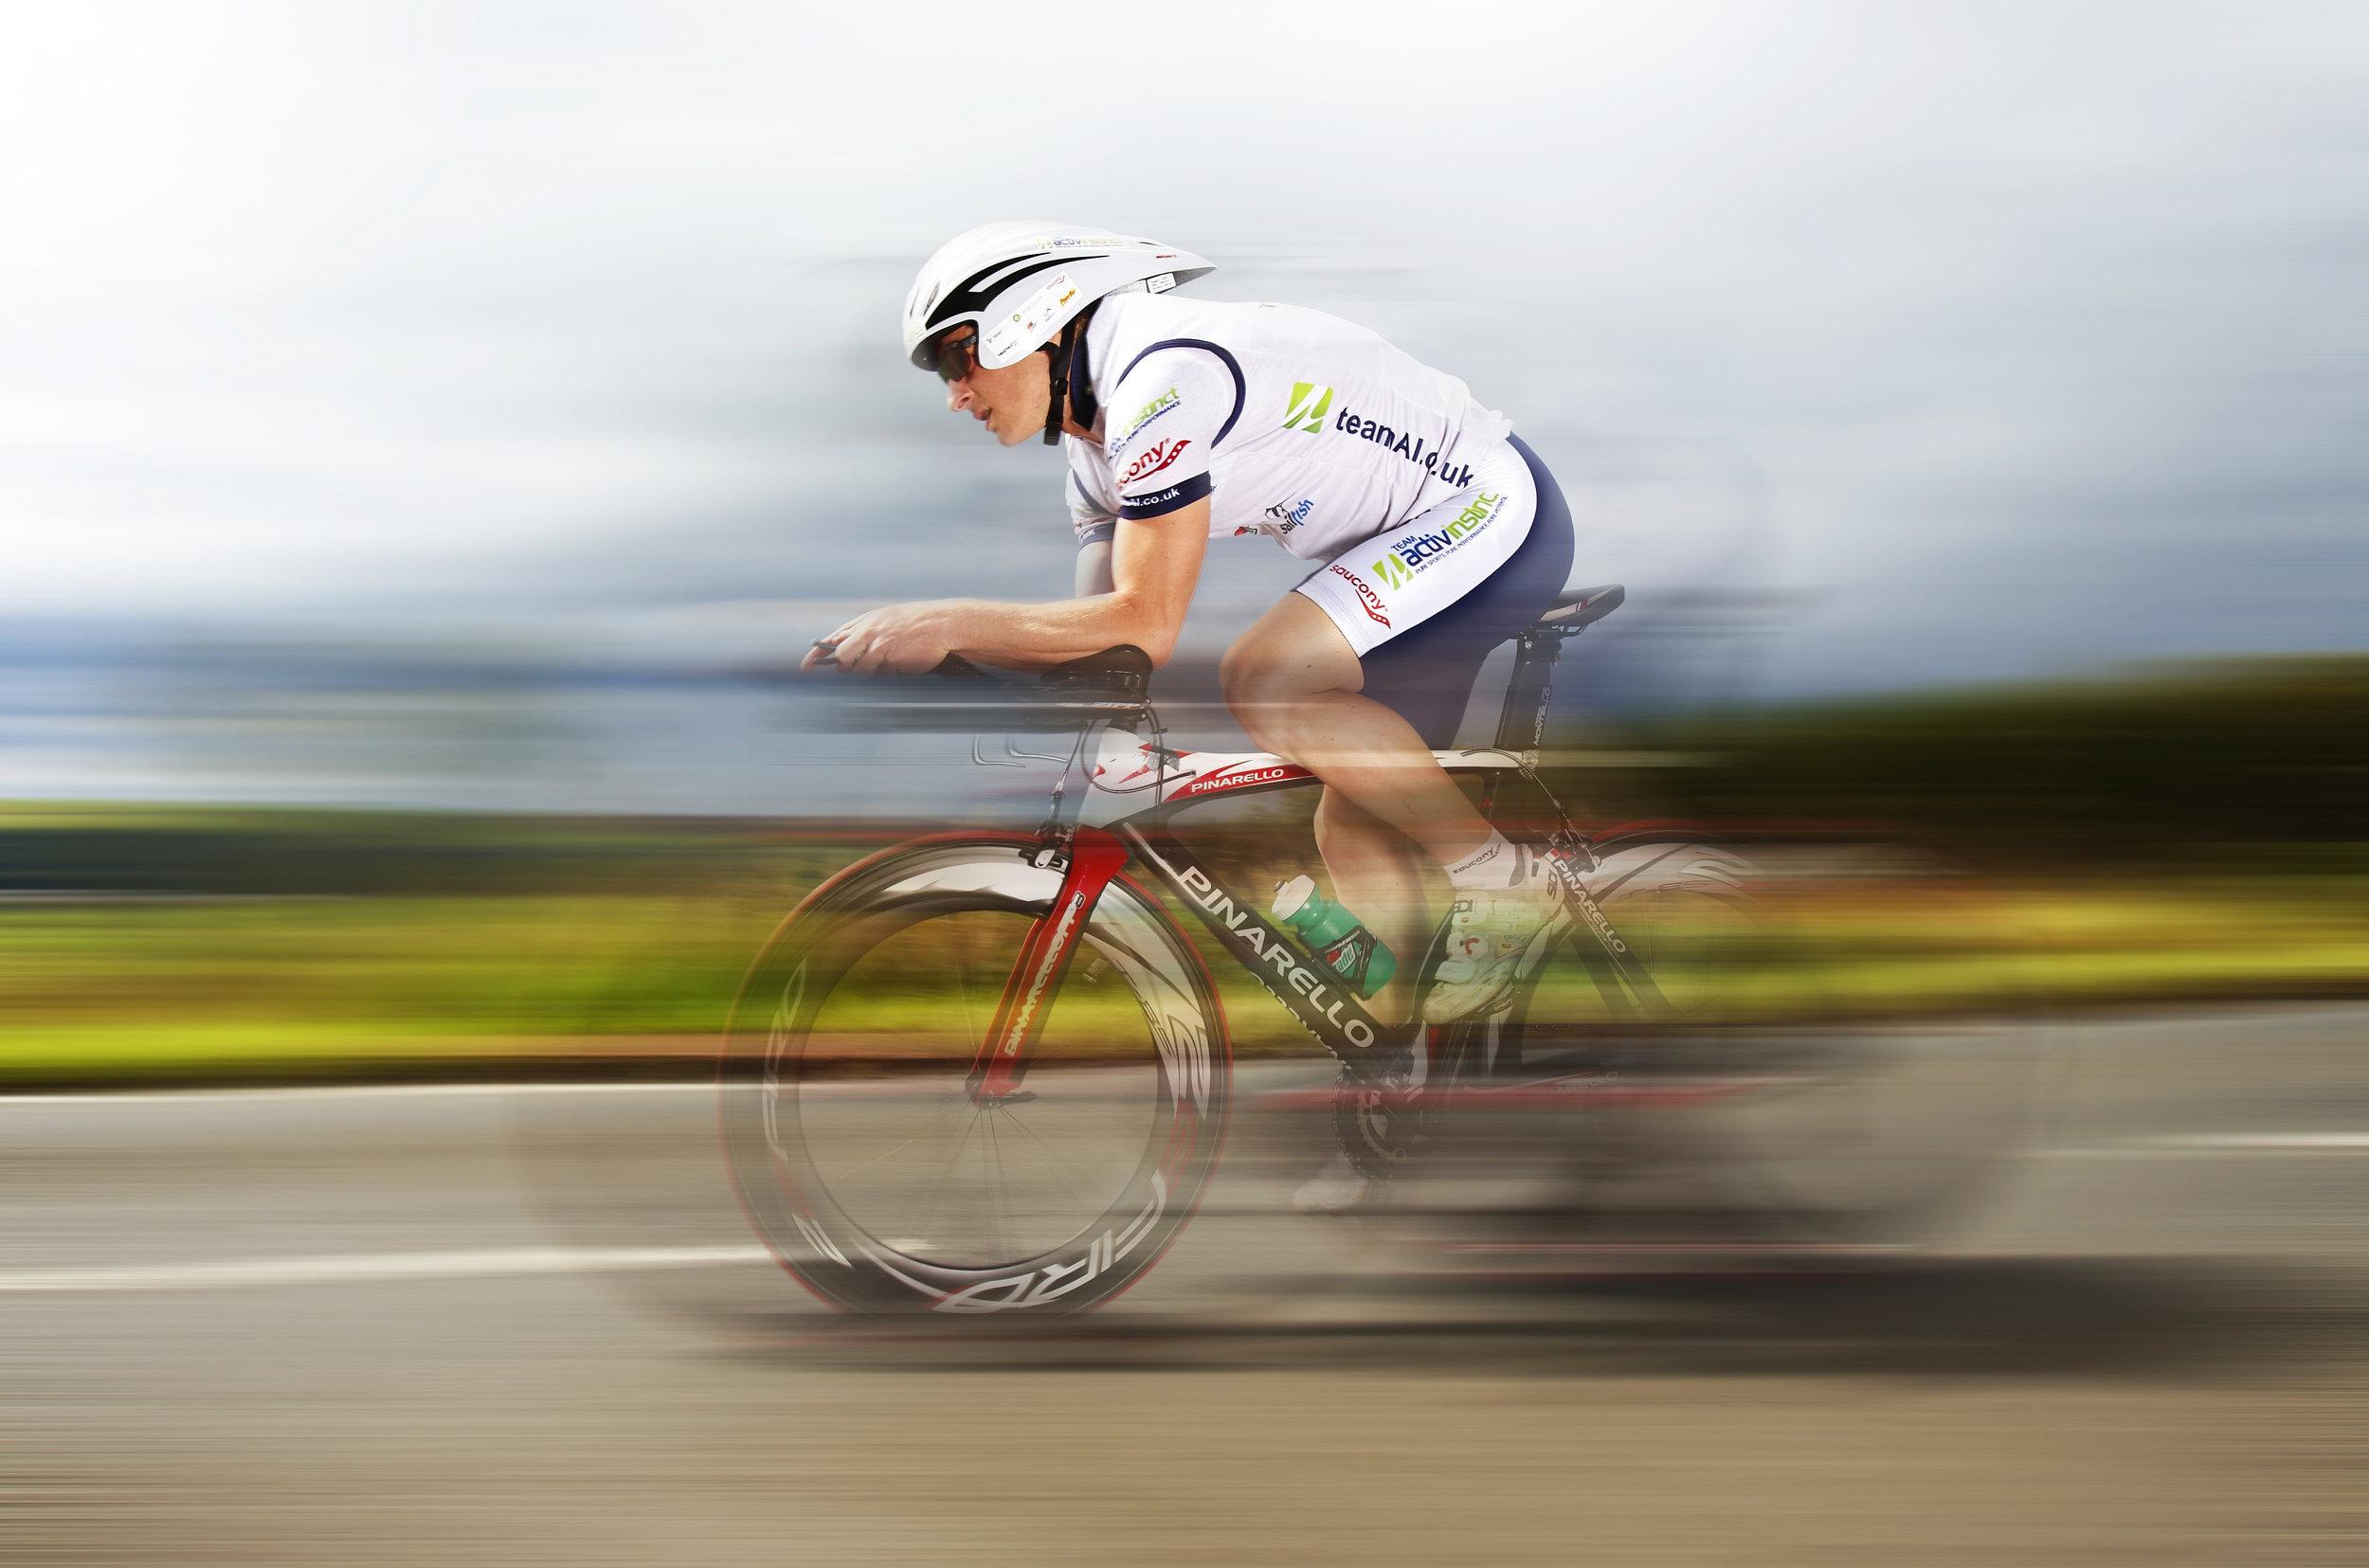 Phillip Graves, Ironman